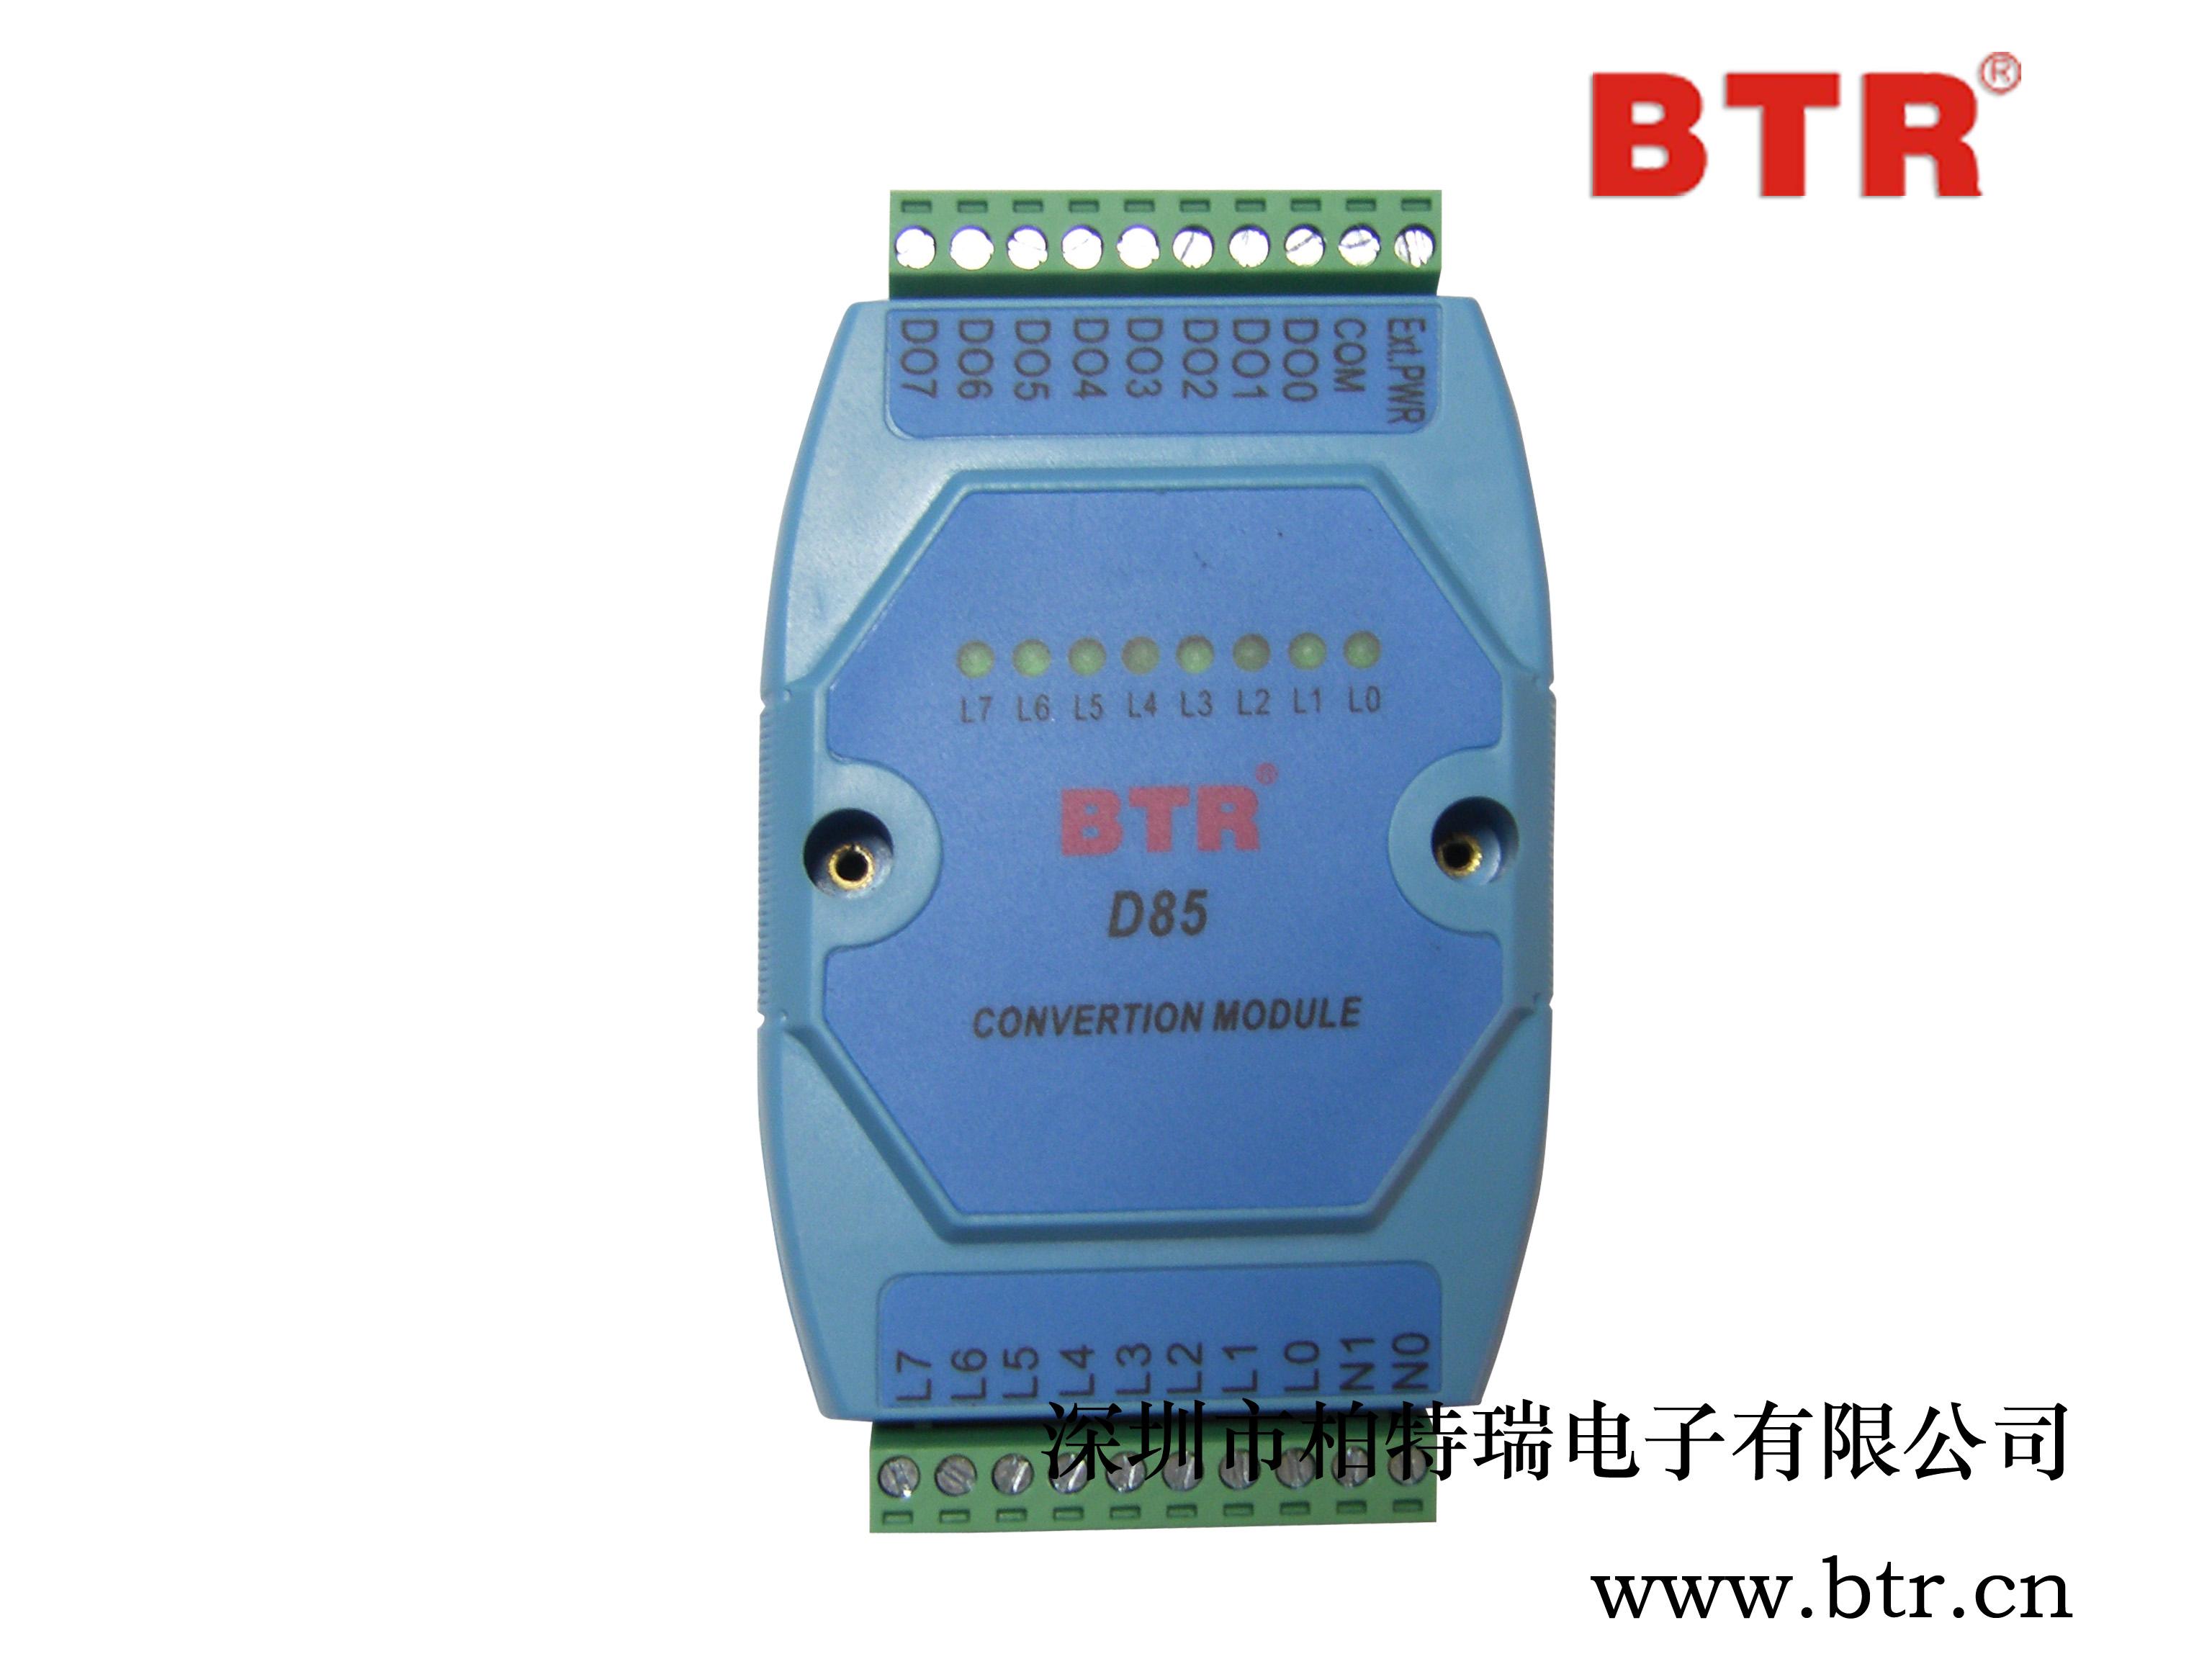 BTR-D85 BTR02045 强电转开关量模块